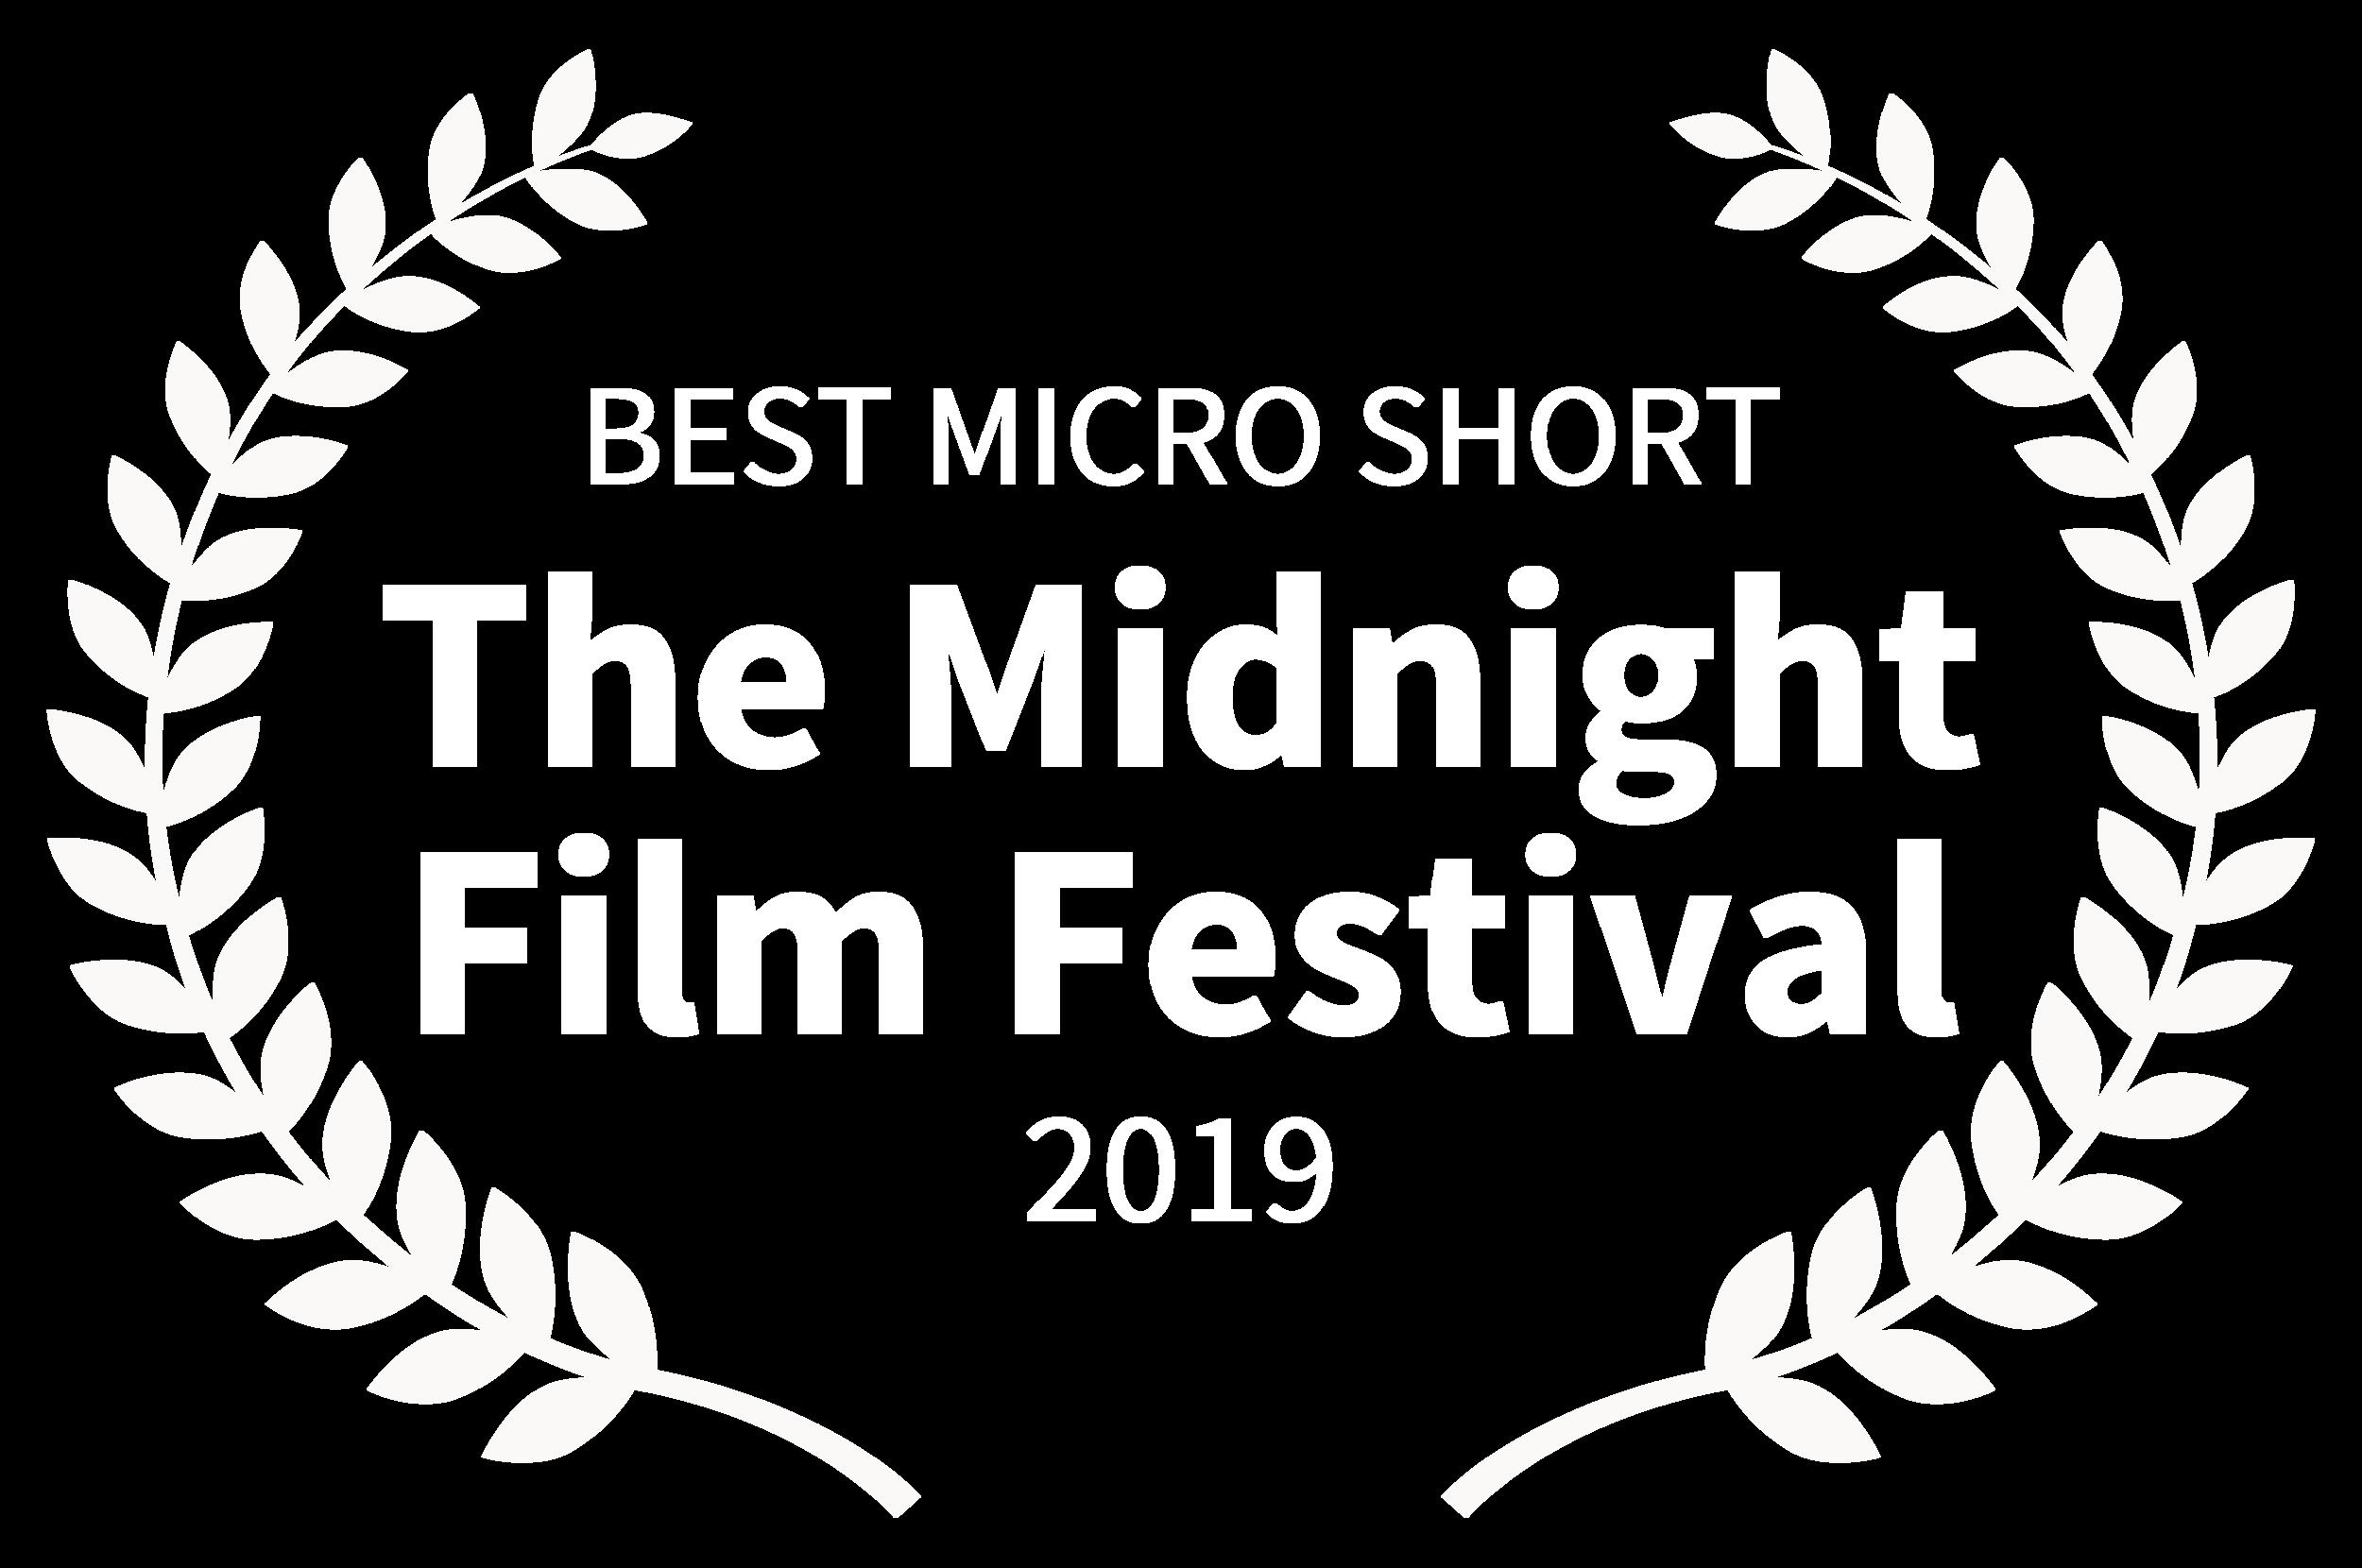 BESTMICROSHORT-TheMidnightFilmFestival-2019.png